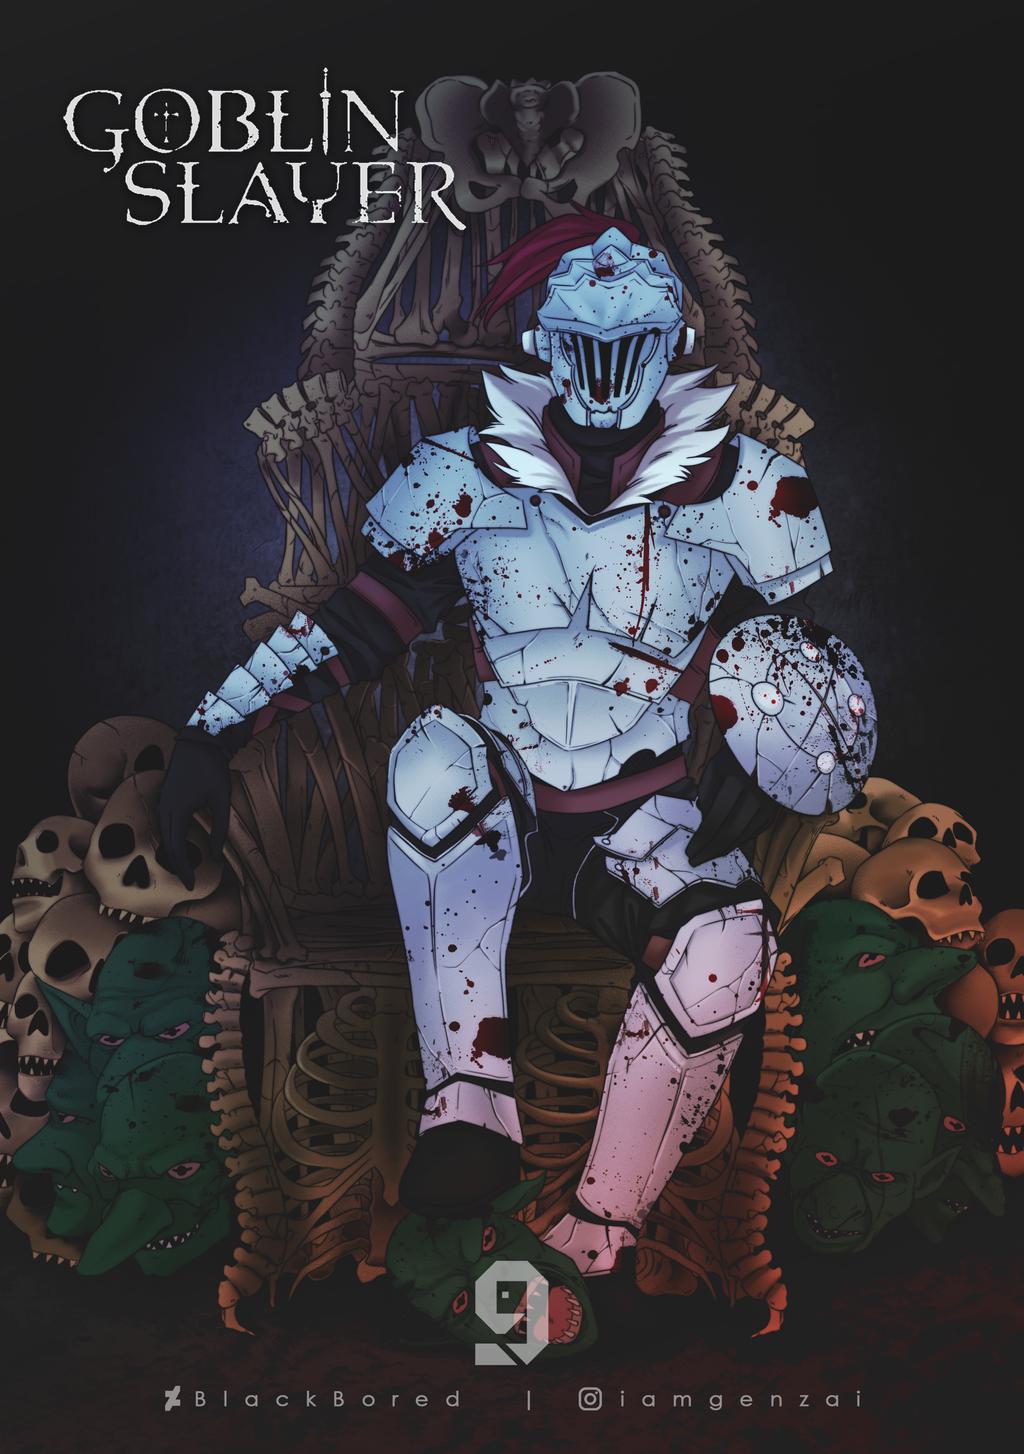 Slayer King (Goblin Slayer AU) | Page 11 | SpaceBattles Forums